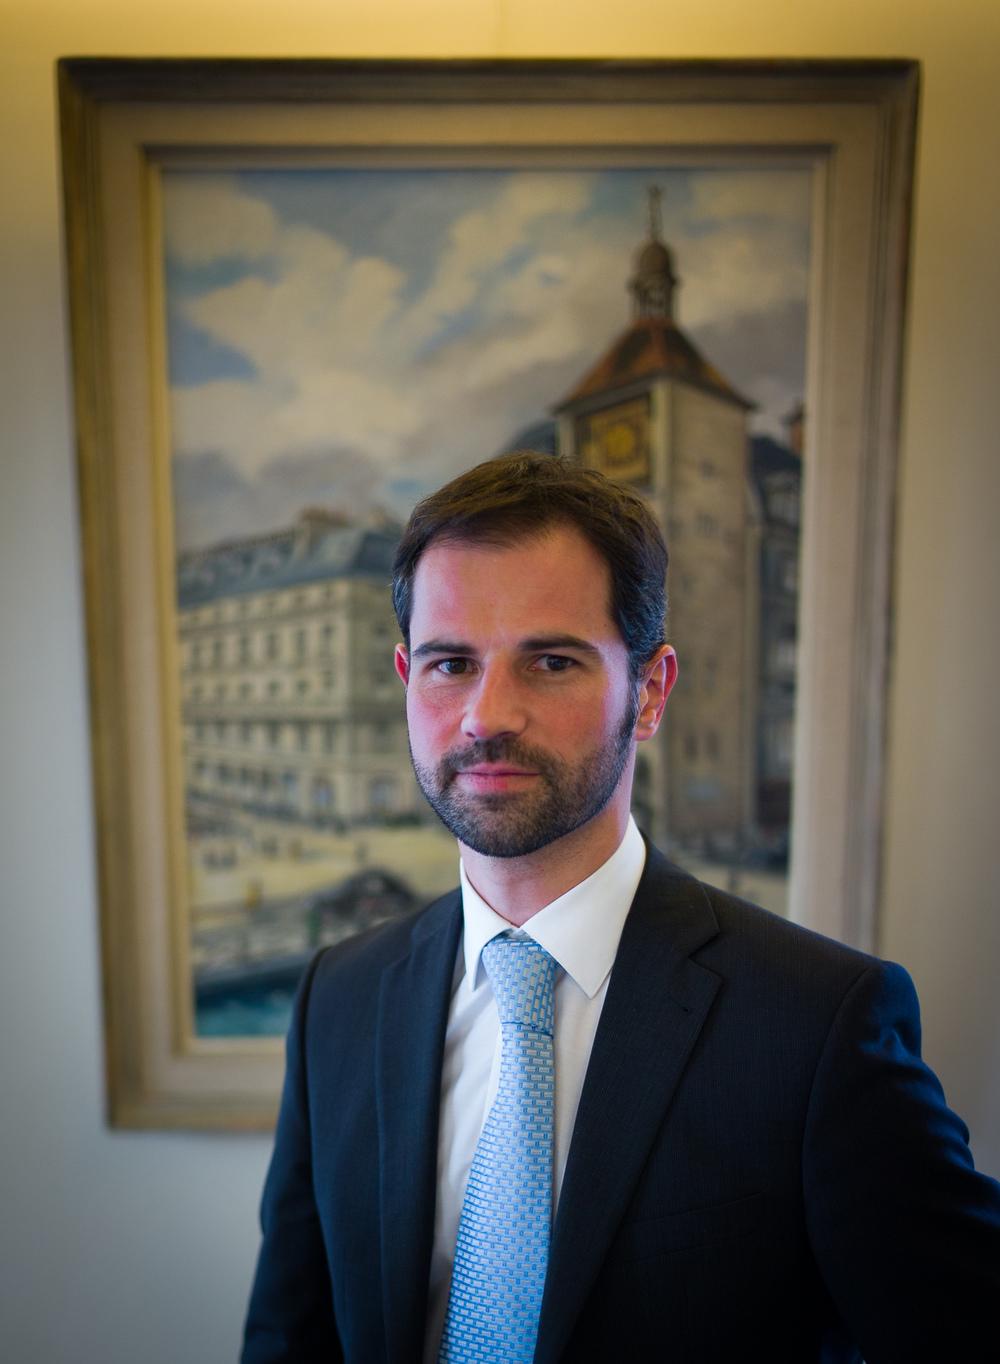 Jerome Meier, photographed inside the Vacheron Constantin historical maison, Geneva, Switzerland